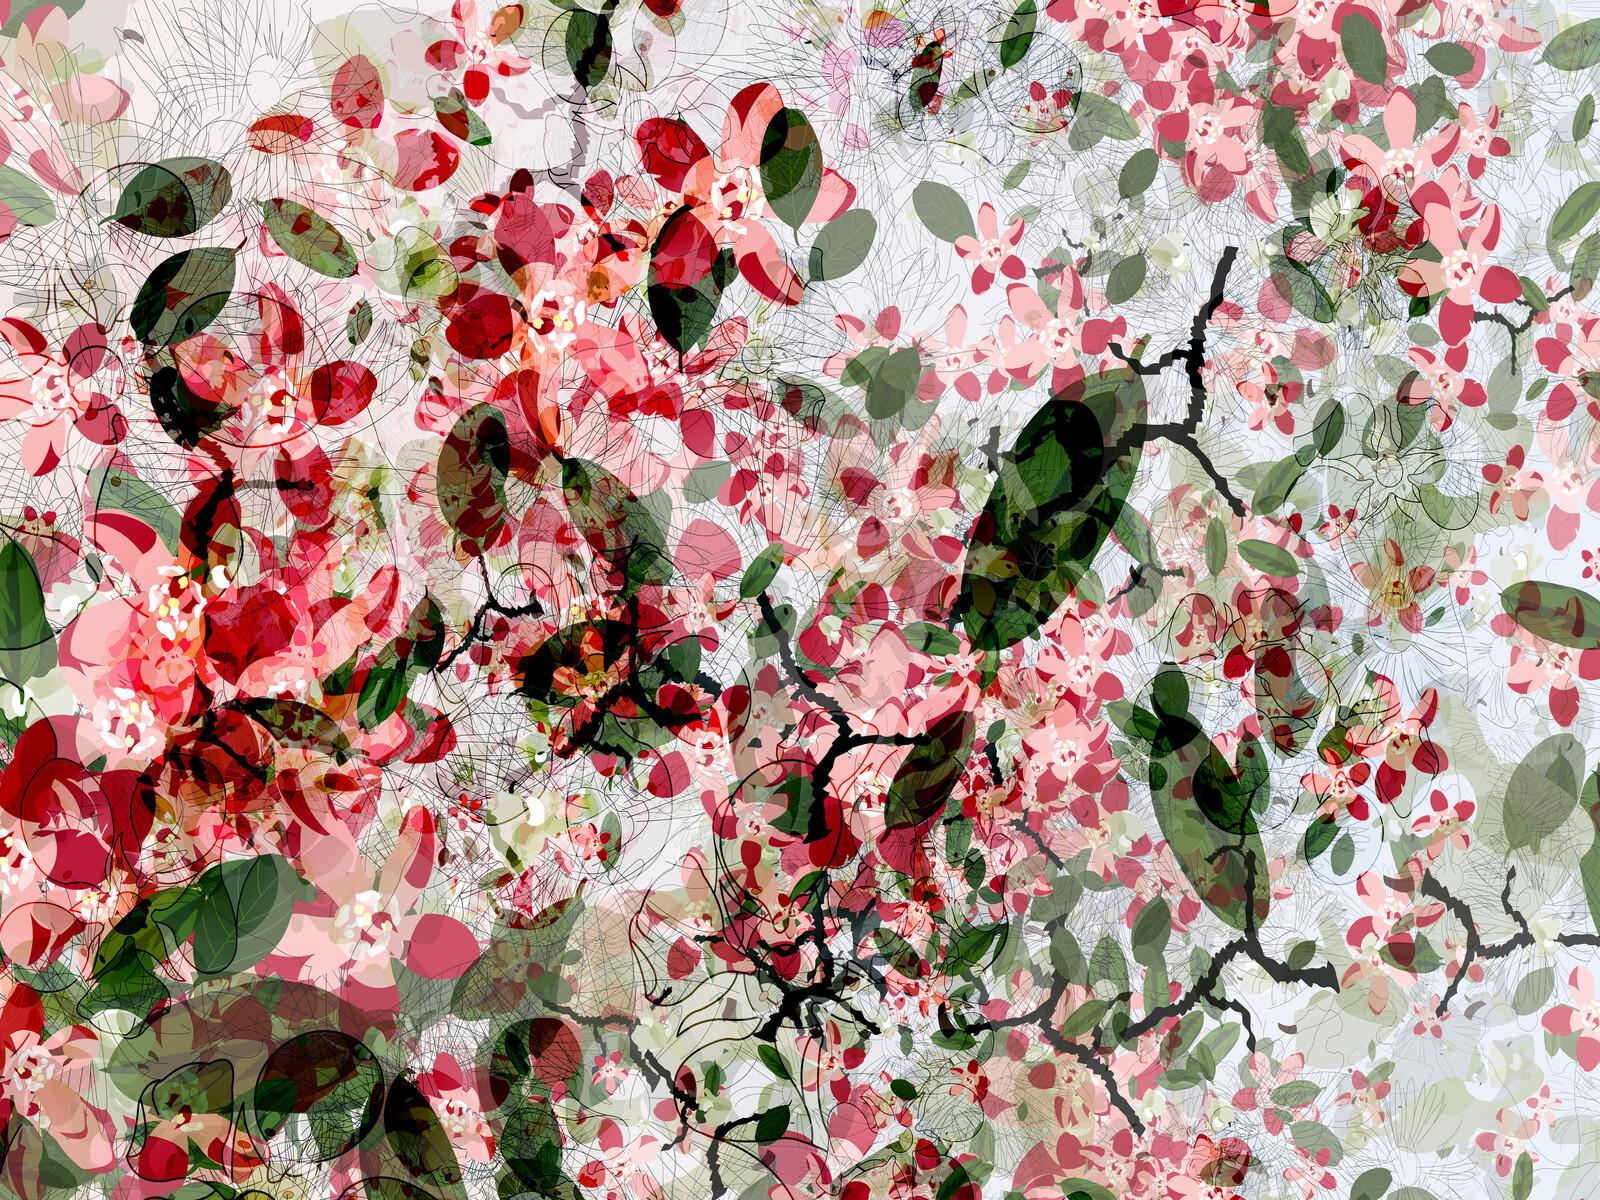 Cherry Blossom - Christine Jaschek